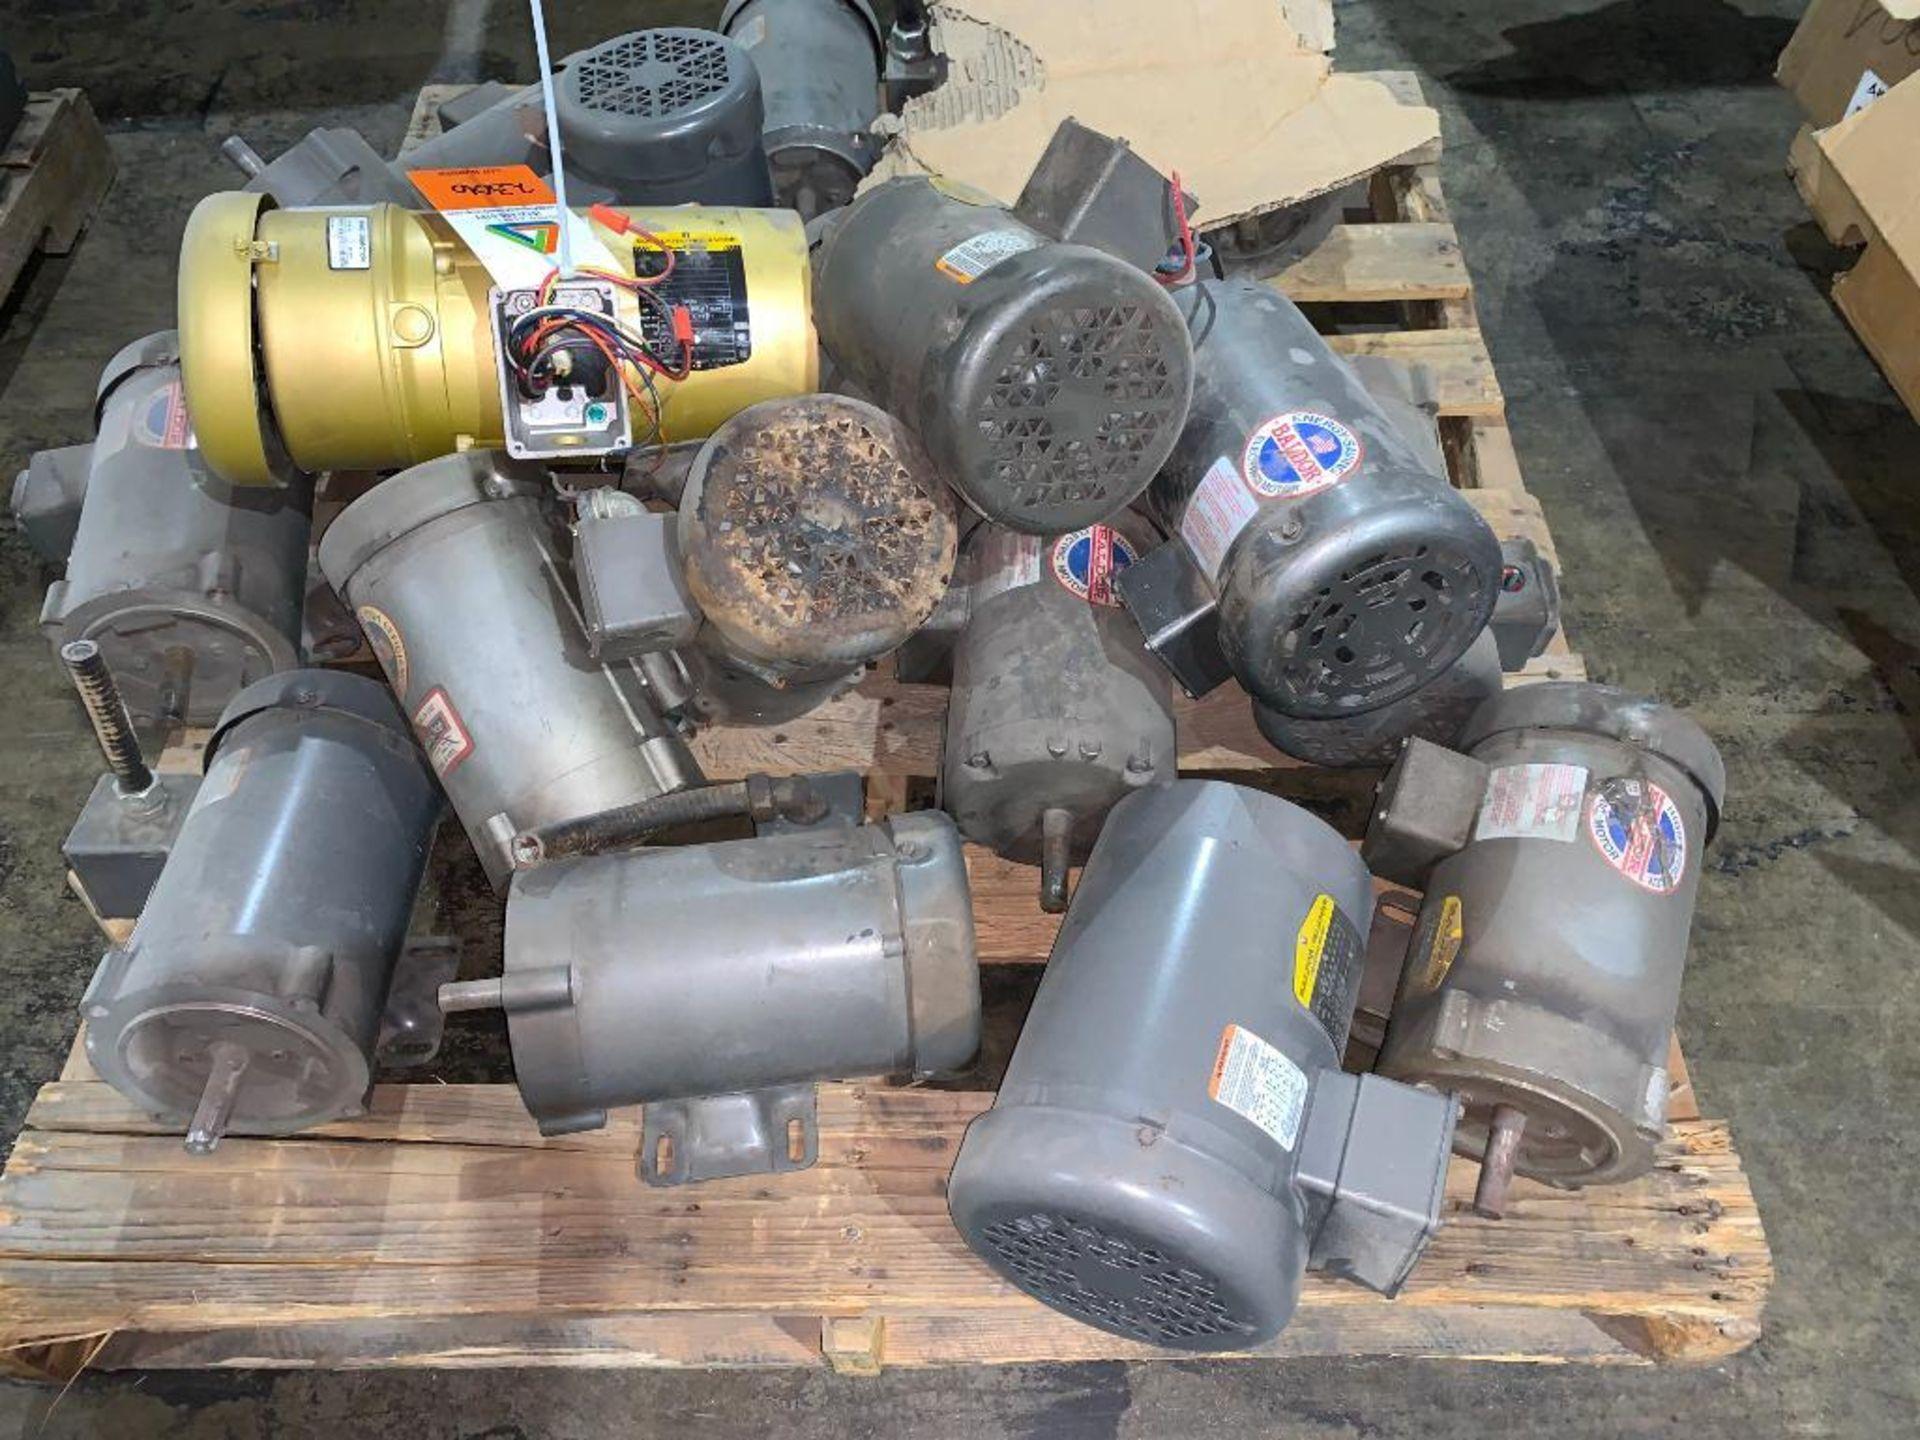 pallet of various used motors - Image 2 of 4